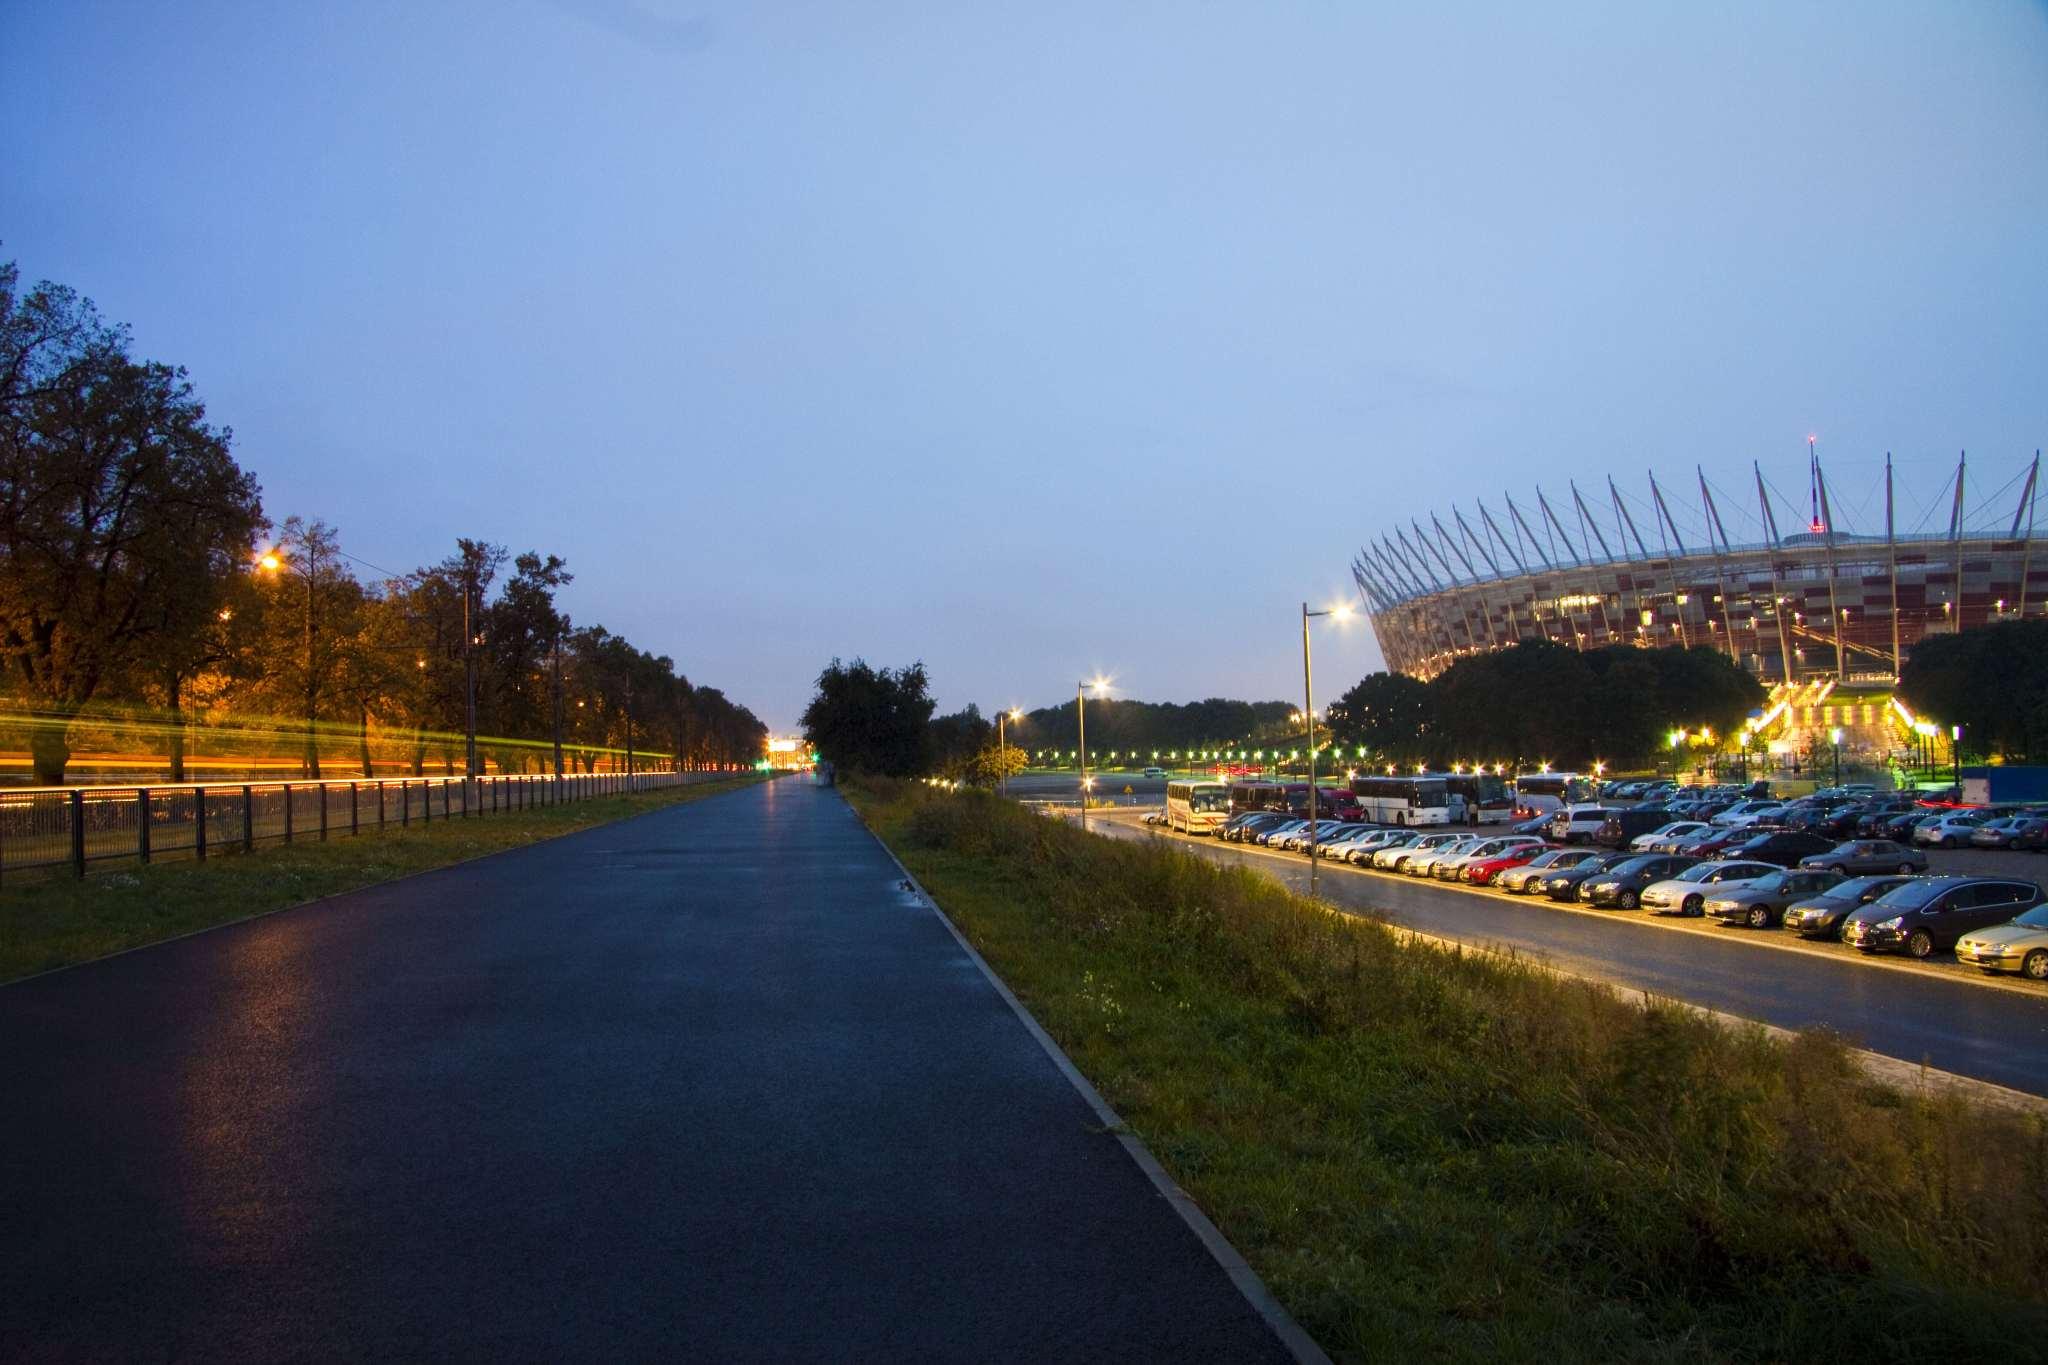 Narodowy Stadium 5